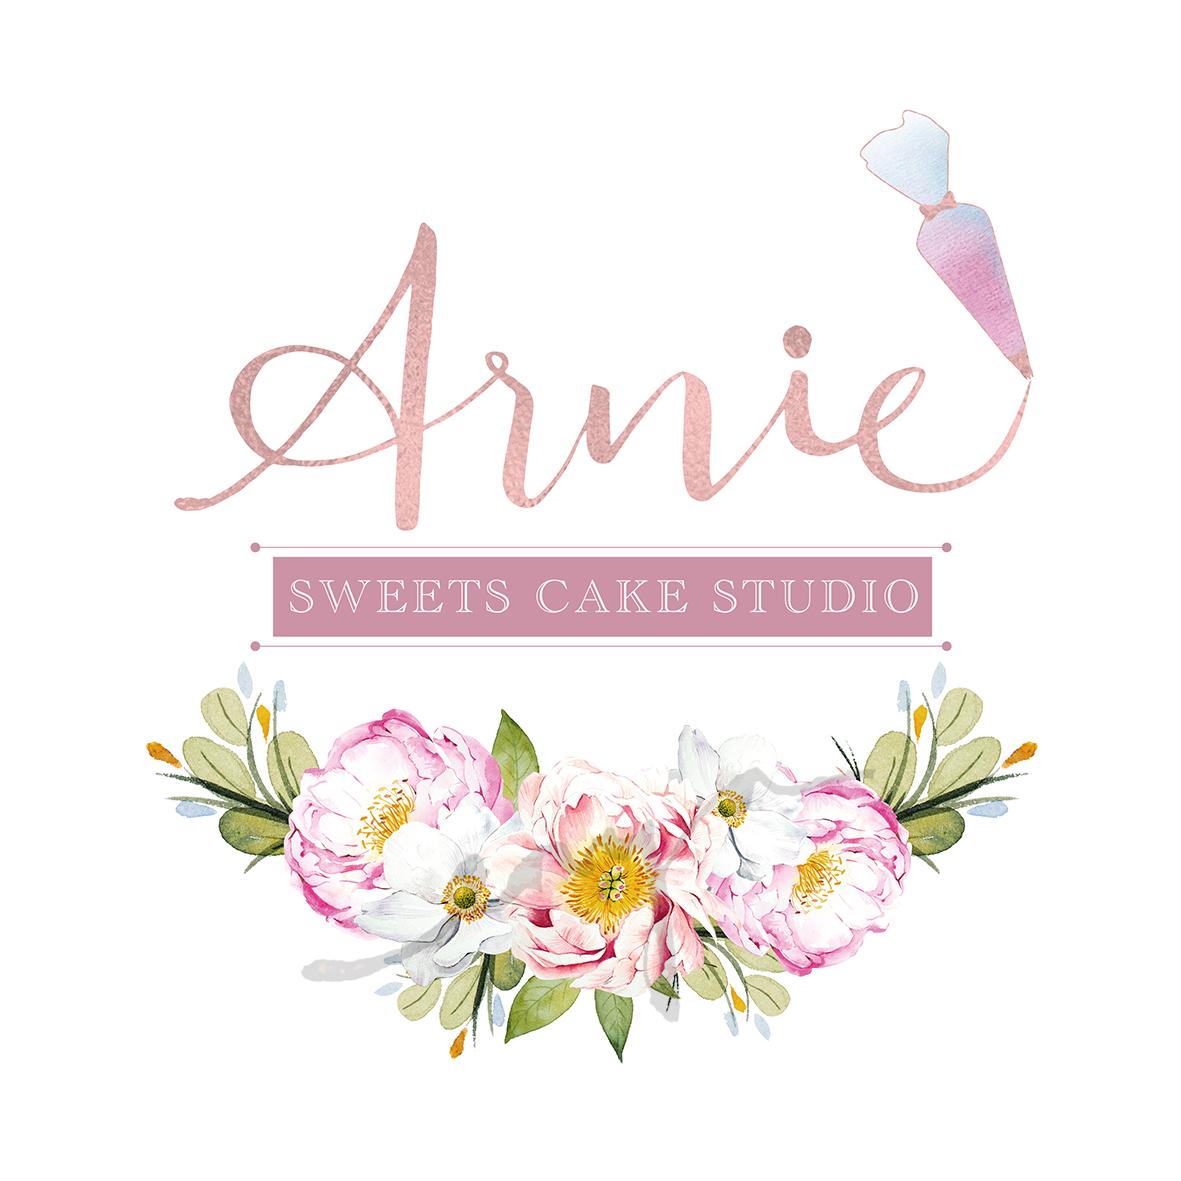 Annie sweets cake studio logo